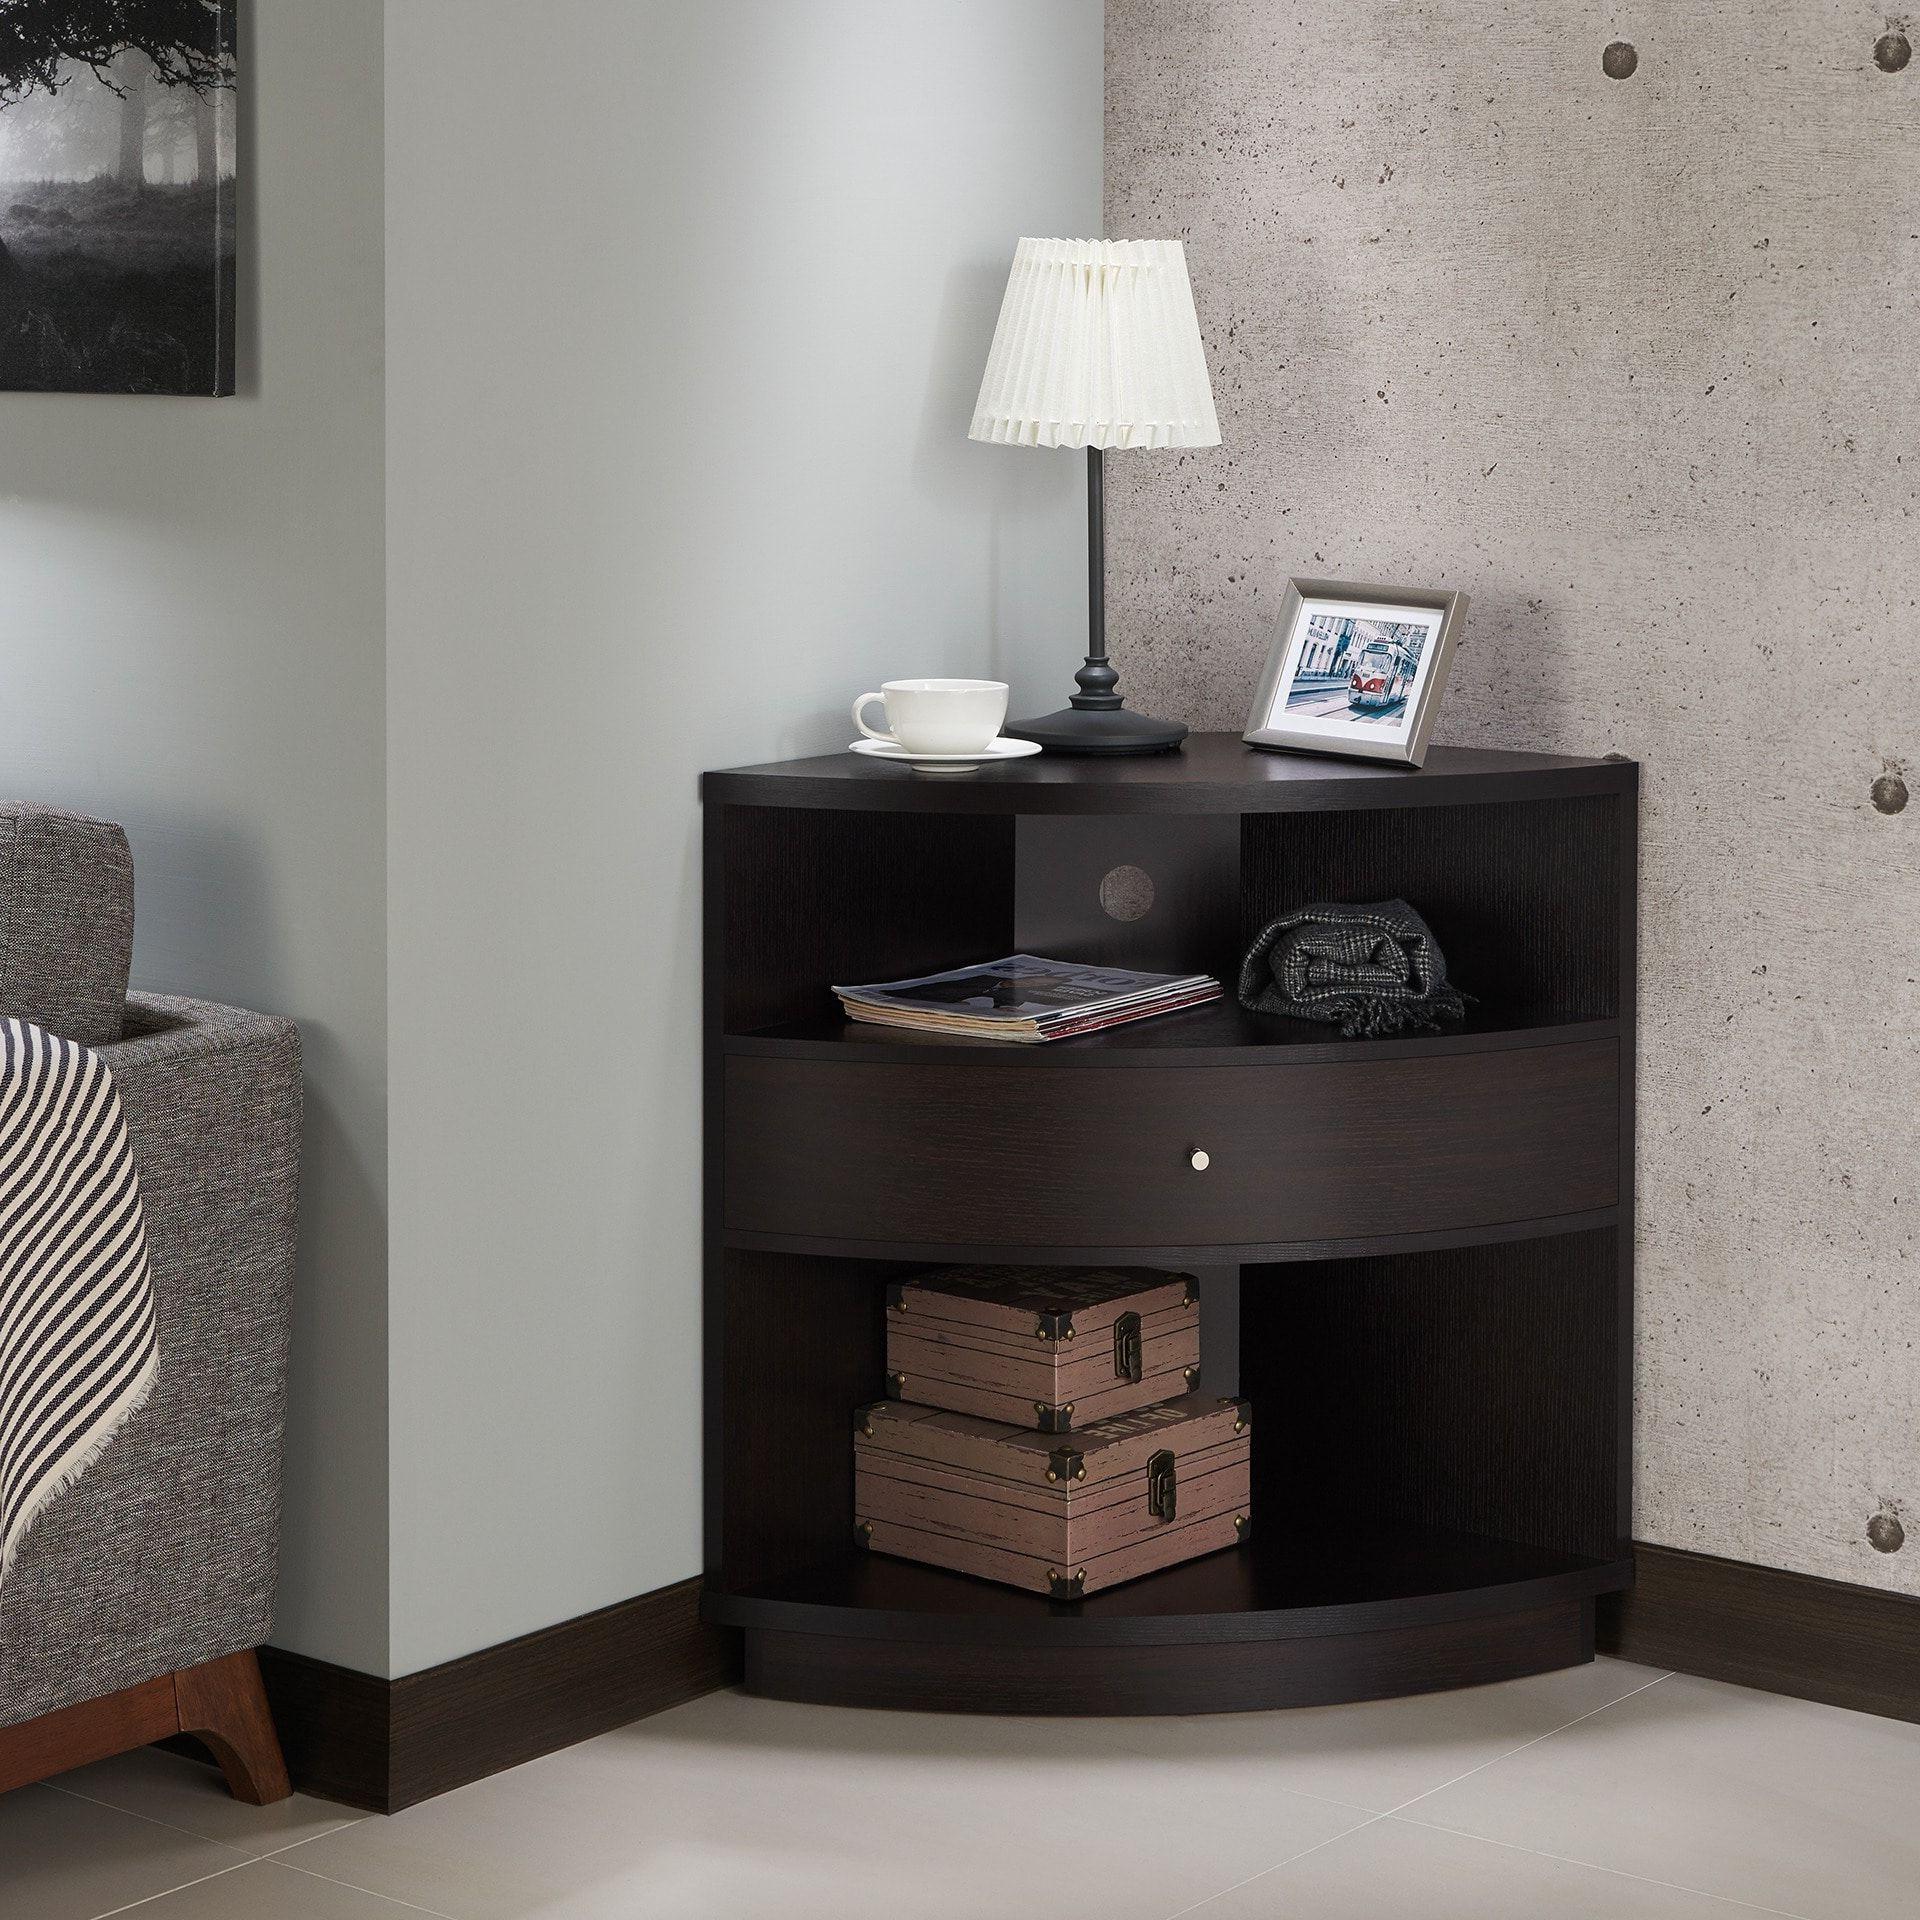 Furniture Of America Aishe Contemporary Multi Shelf Corner Regarding Multi Shelf Corner Buffets (View 7 of 20)